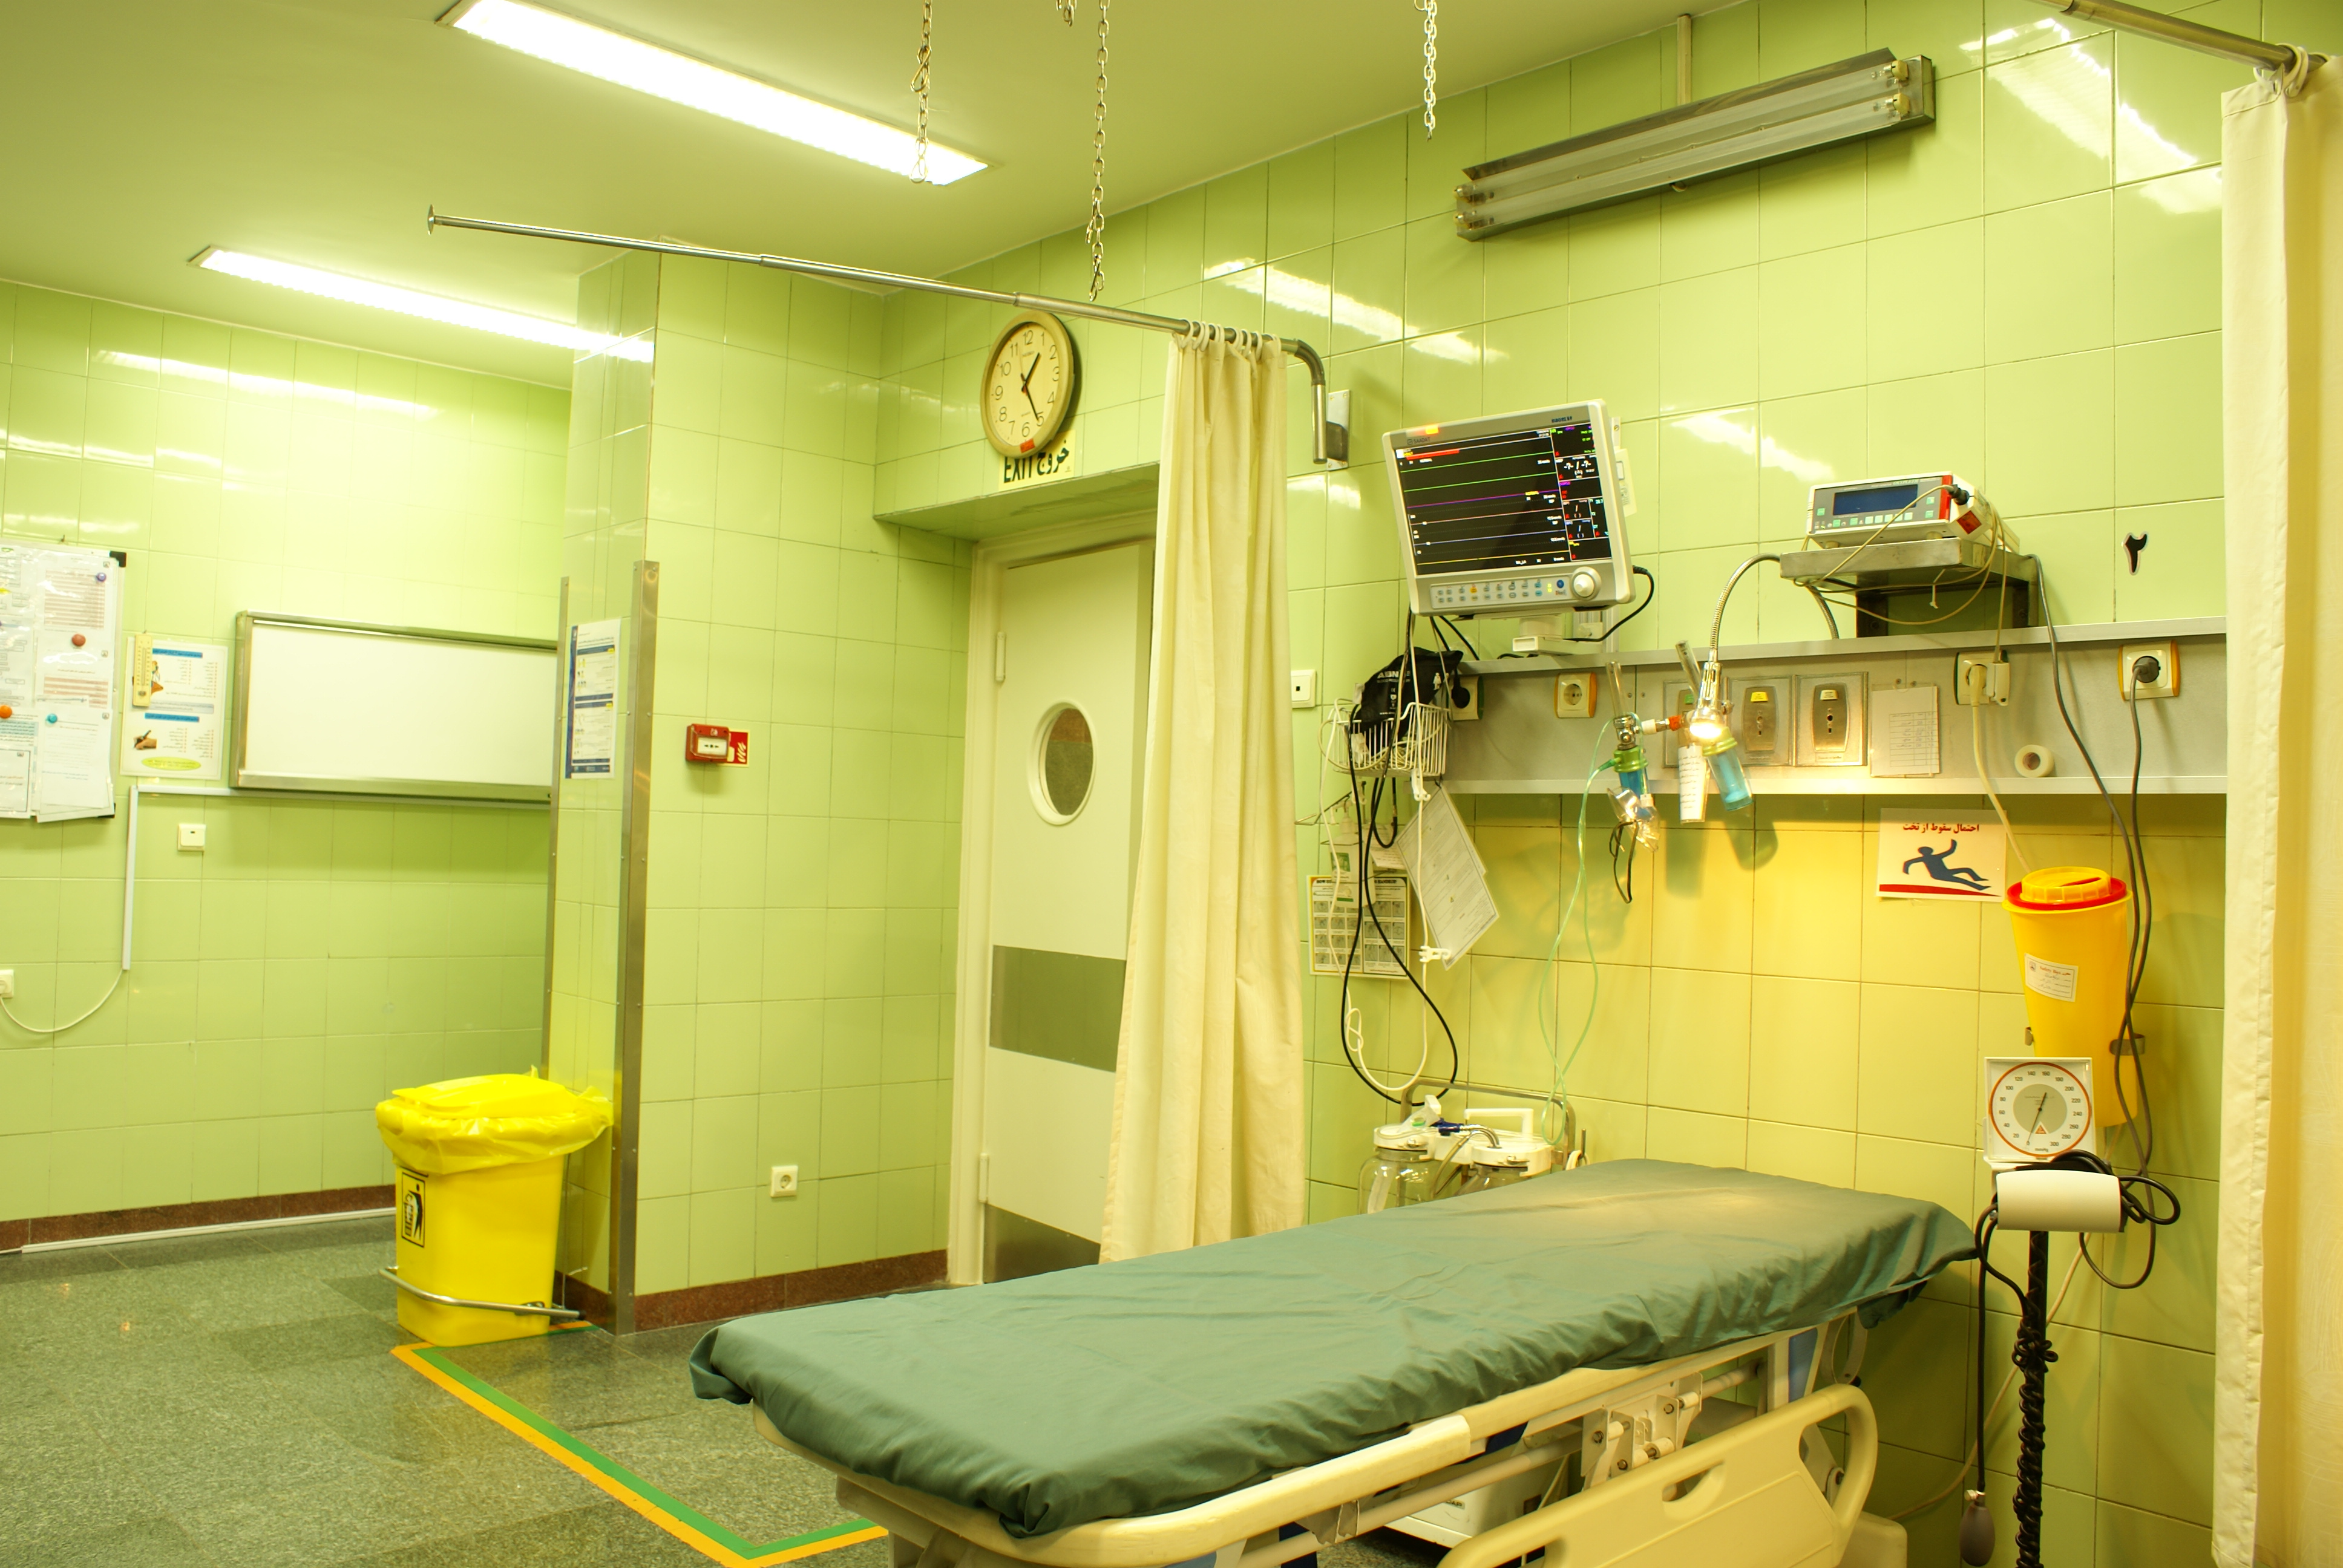 MEHR HOSPITAL